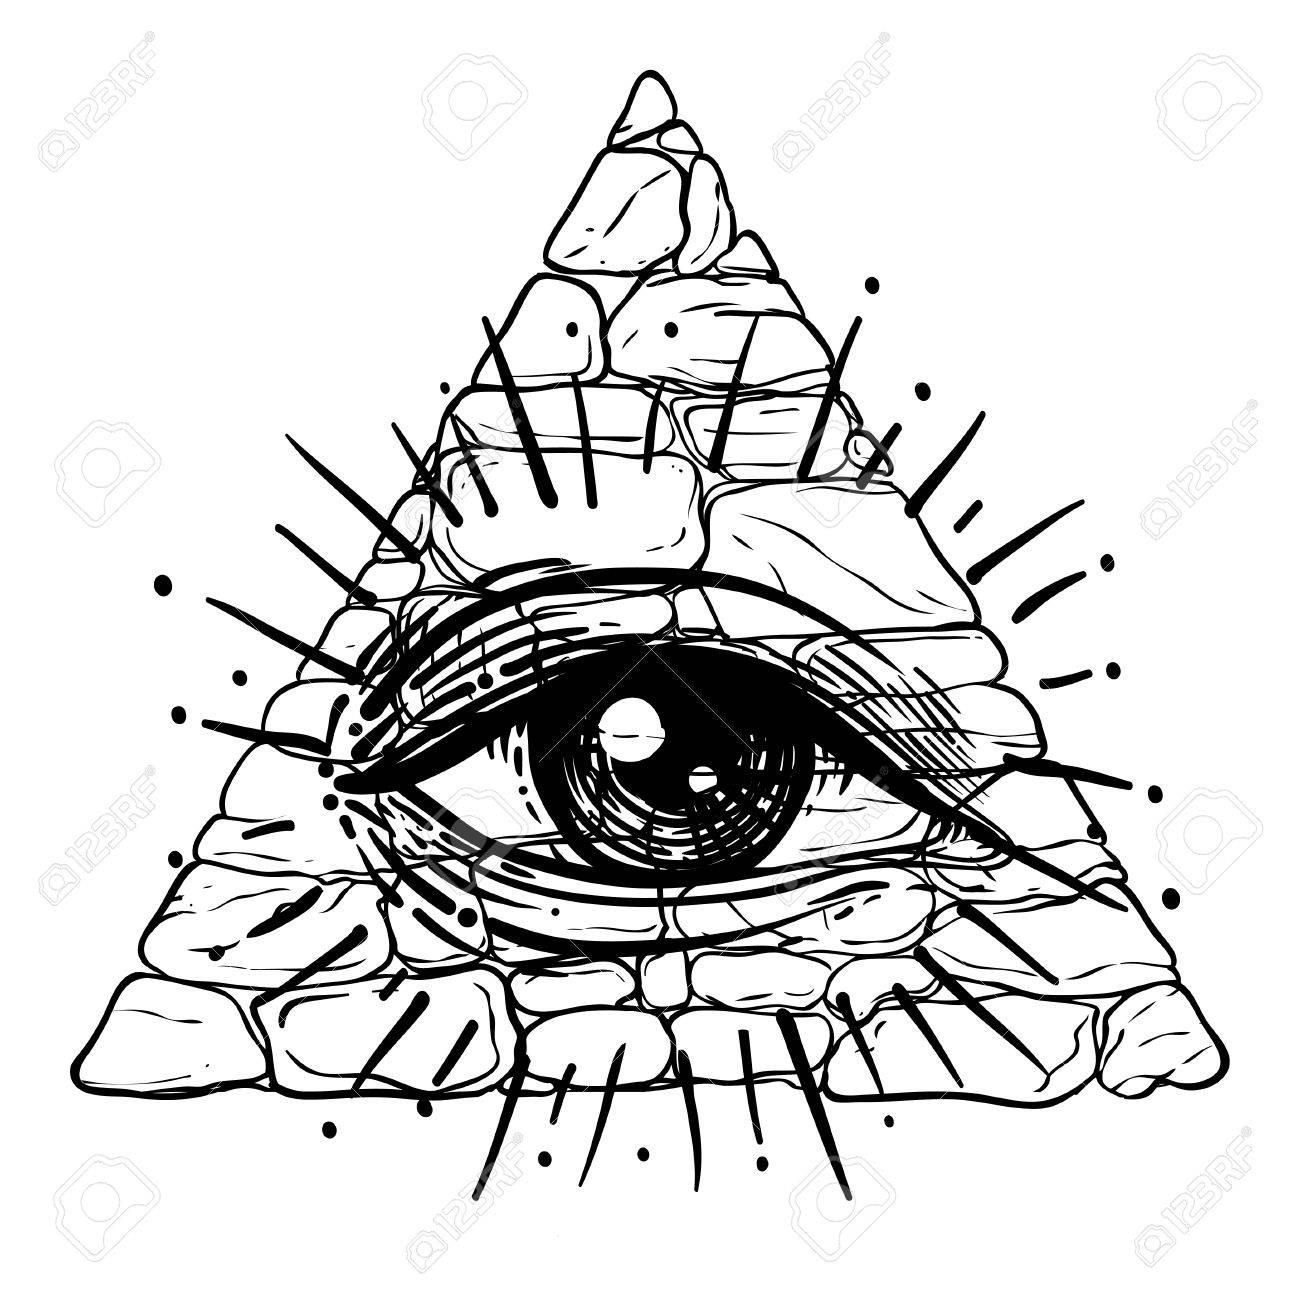 1300x1300 Eye Of Providence. Masonic Symbol. All Seeing Eye Inside Triangle